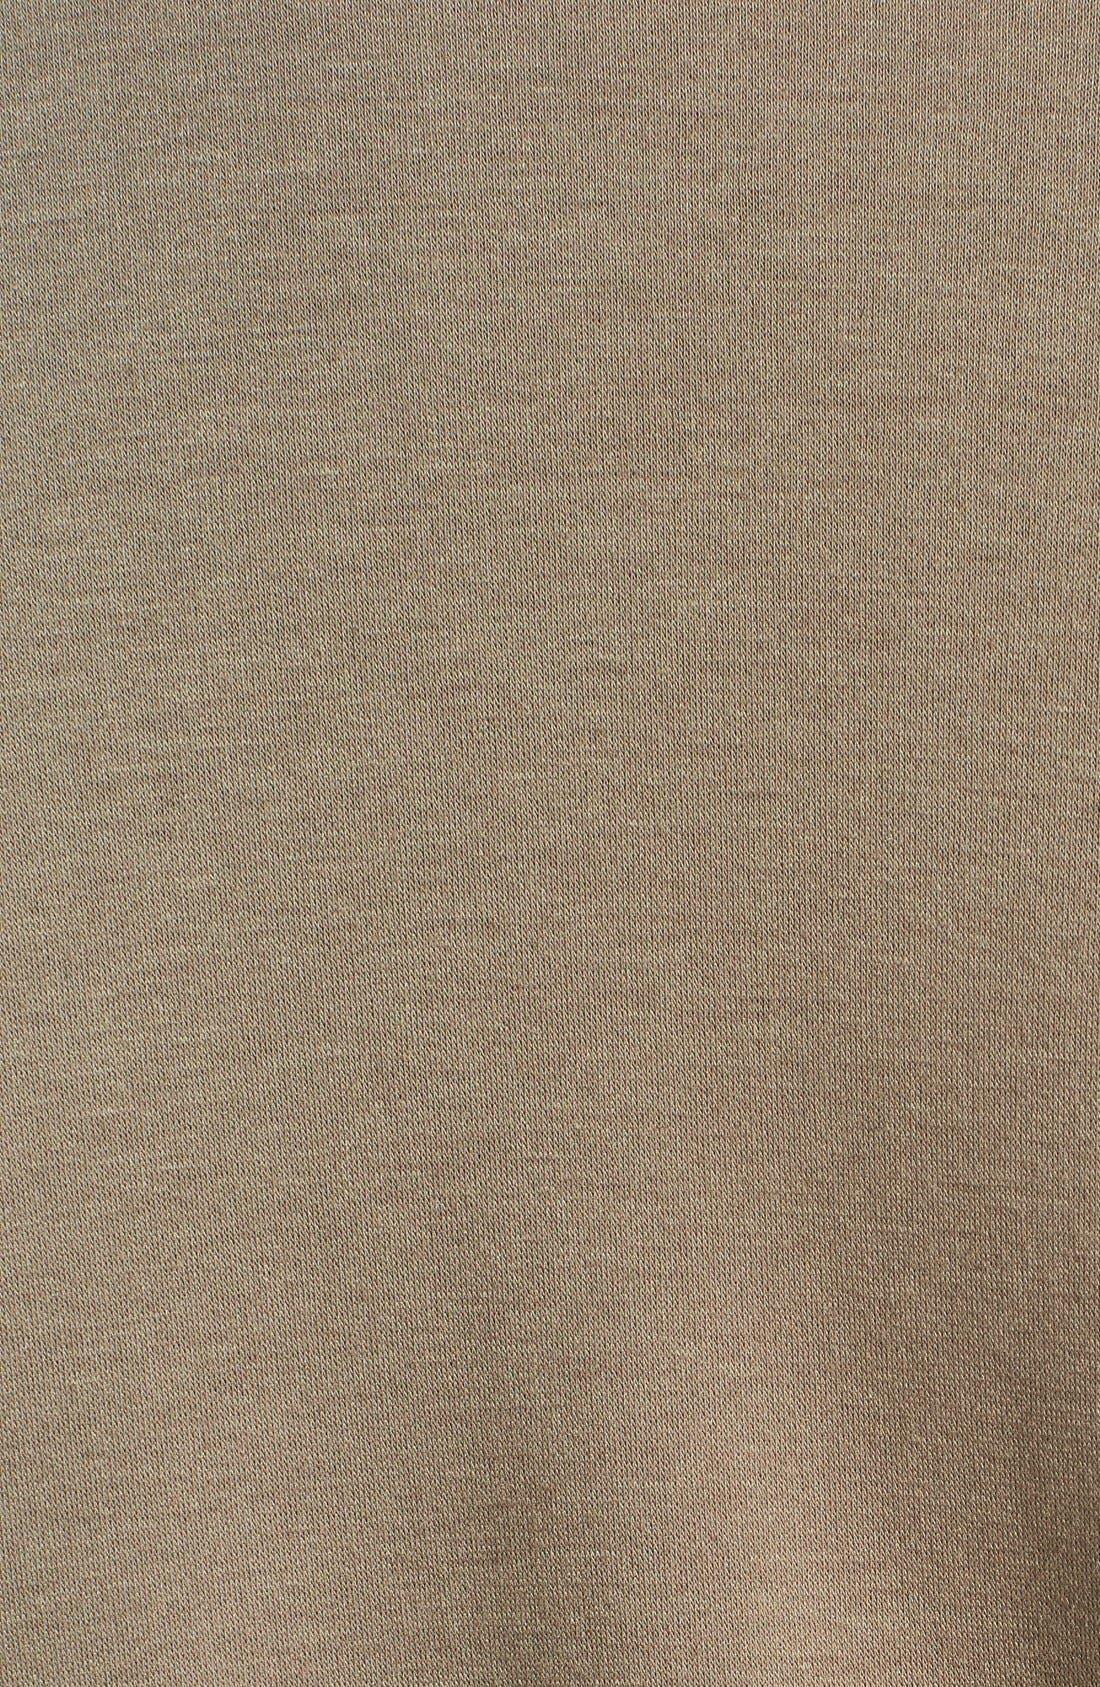 One-Button Fleece Cardigan,                             Alternate thumbnail 111, color,